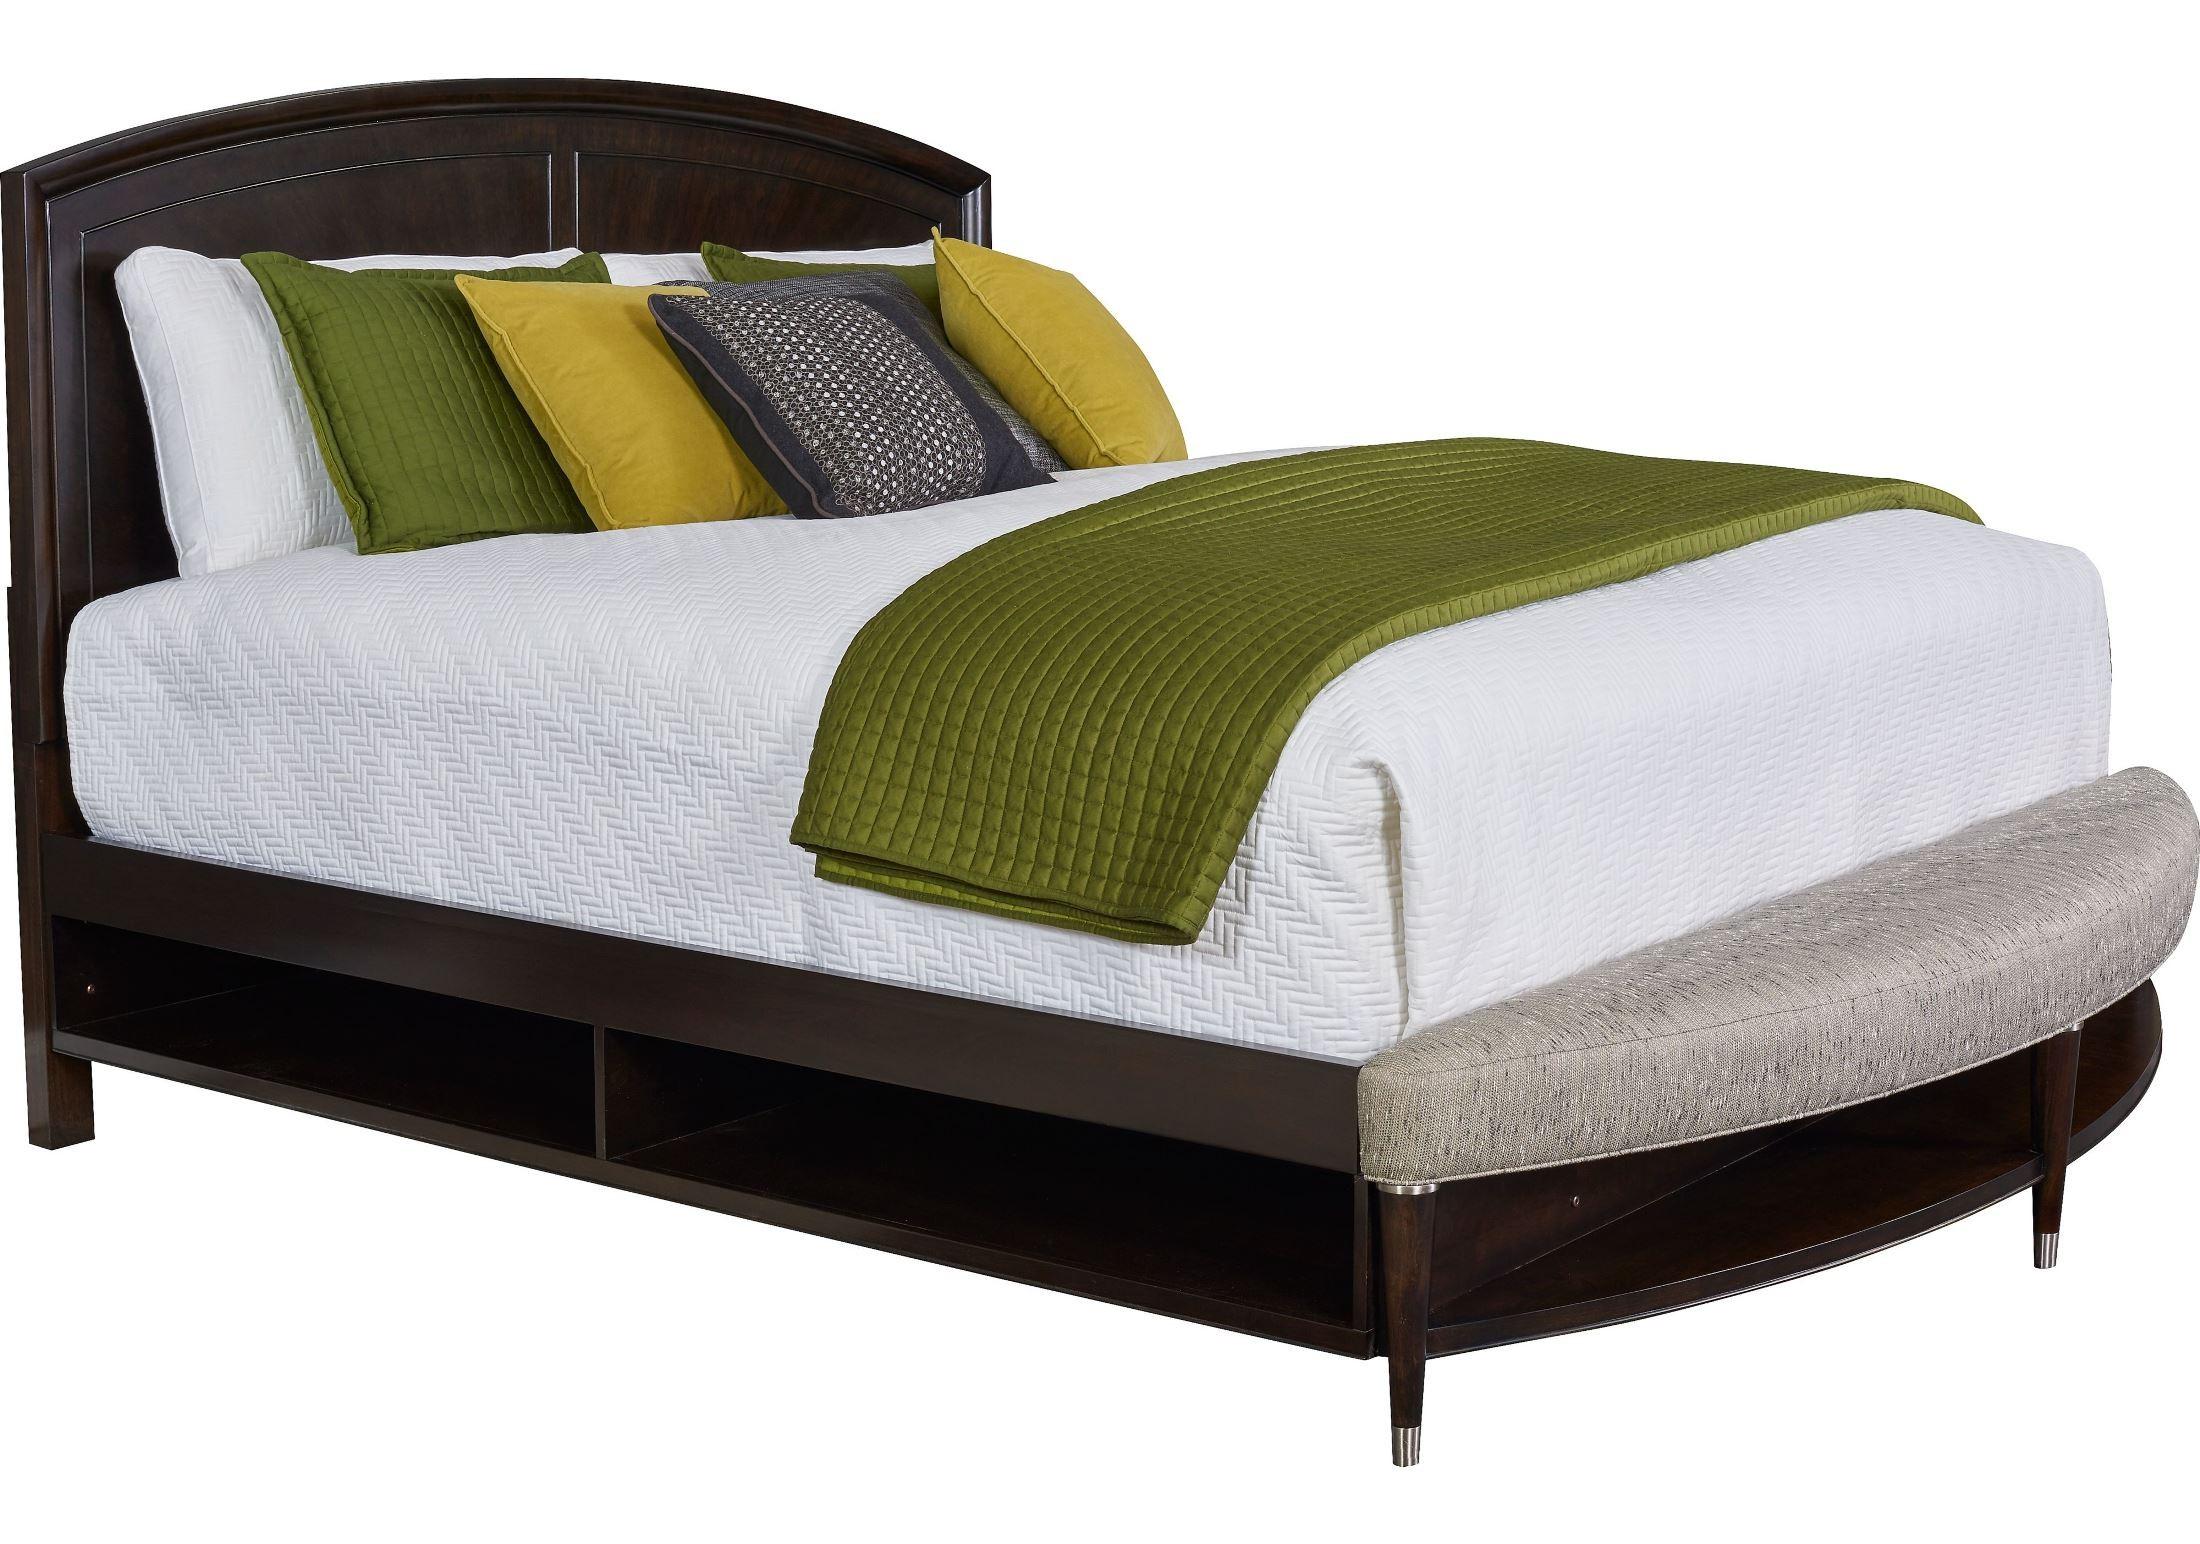 Vibe Merlot King Radius Bench Panel Storage Bed From